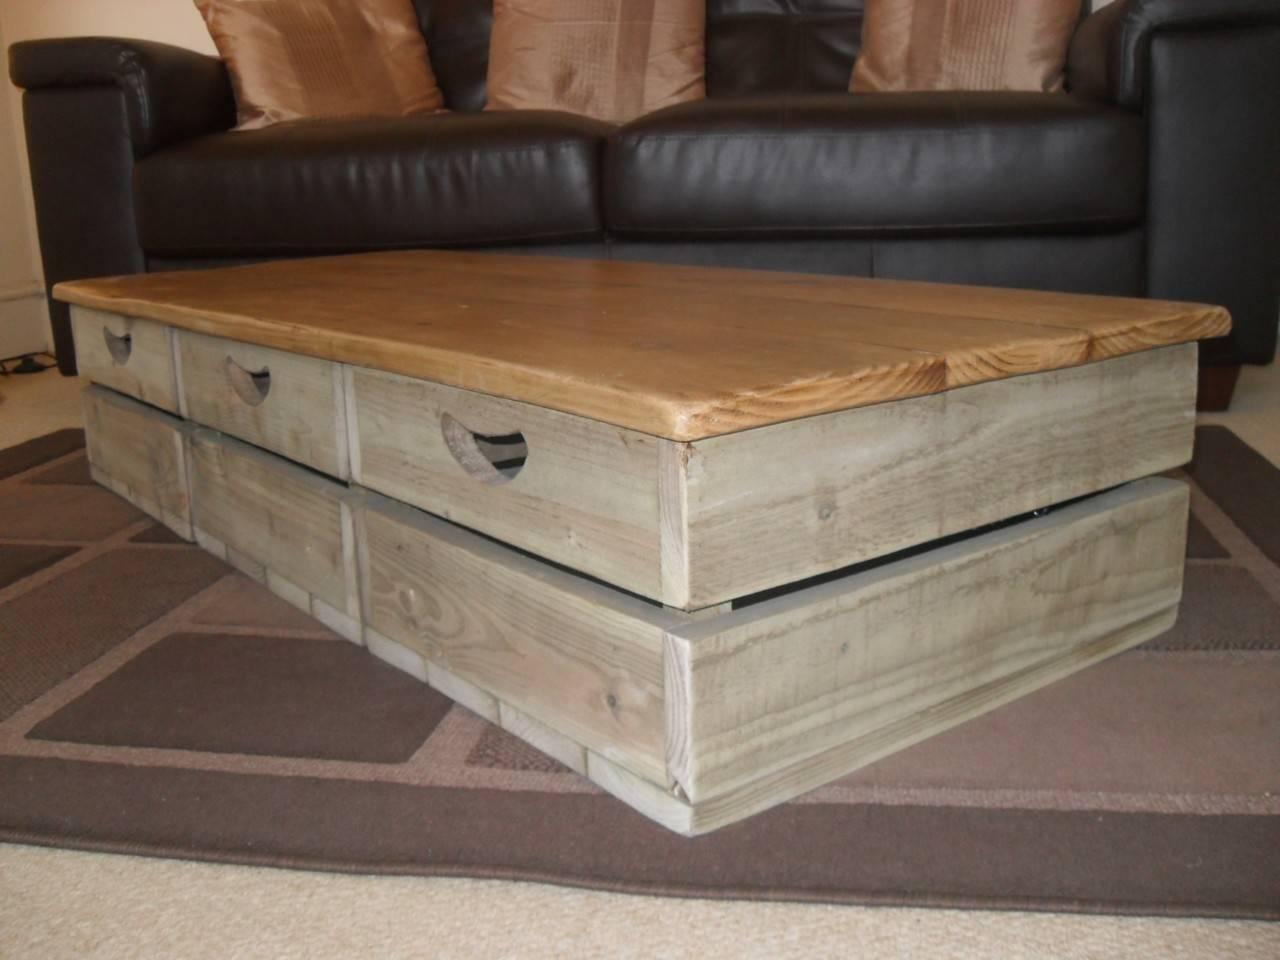 Rustic Storage Coffee Table | Tedxumkc Decoration pertaining to Rustic Storage Diy Coffee Tables (Image 26 of 30)